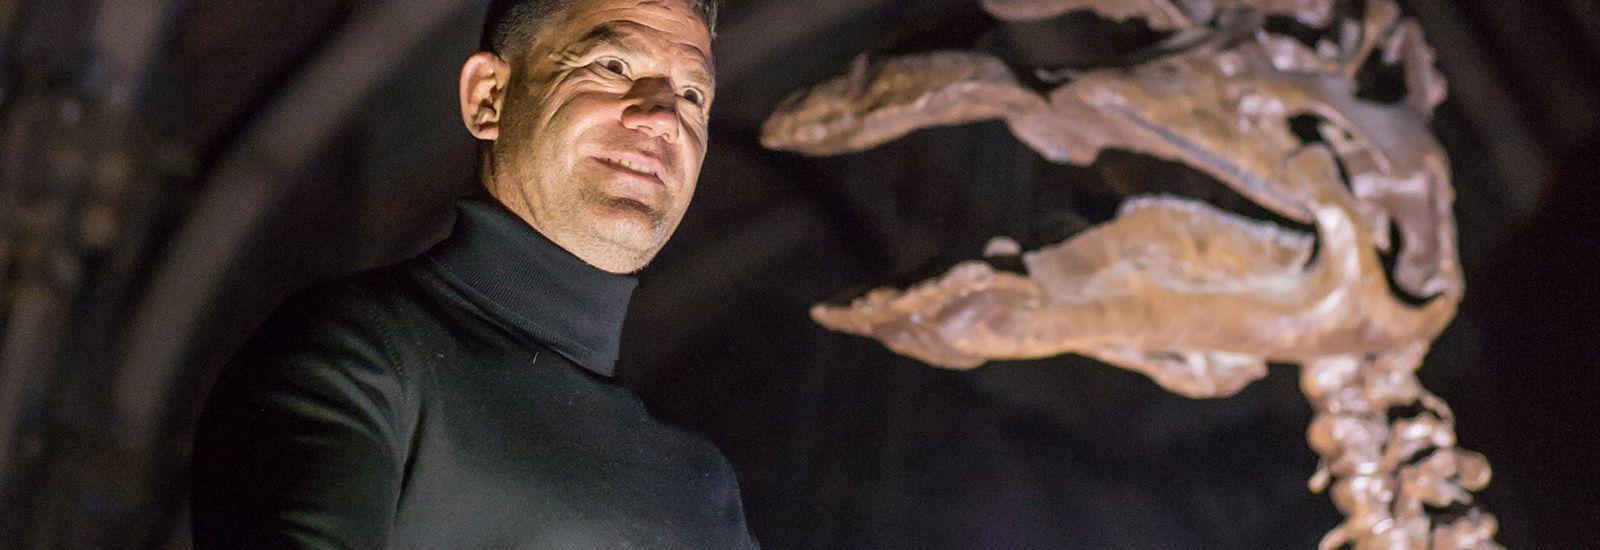 Steve Backshall and dinosaur skeleton